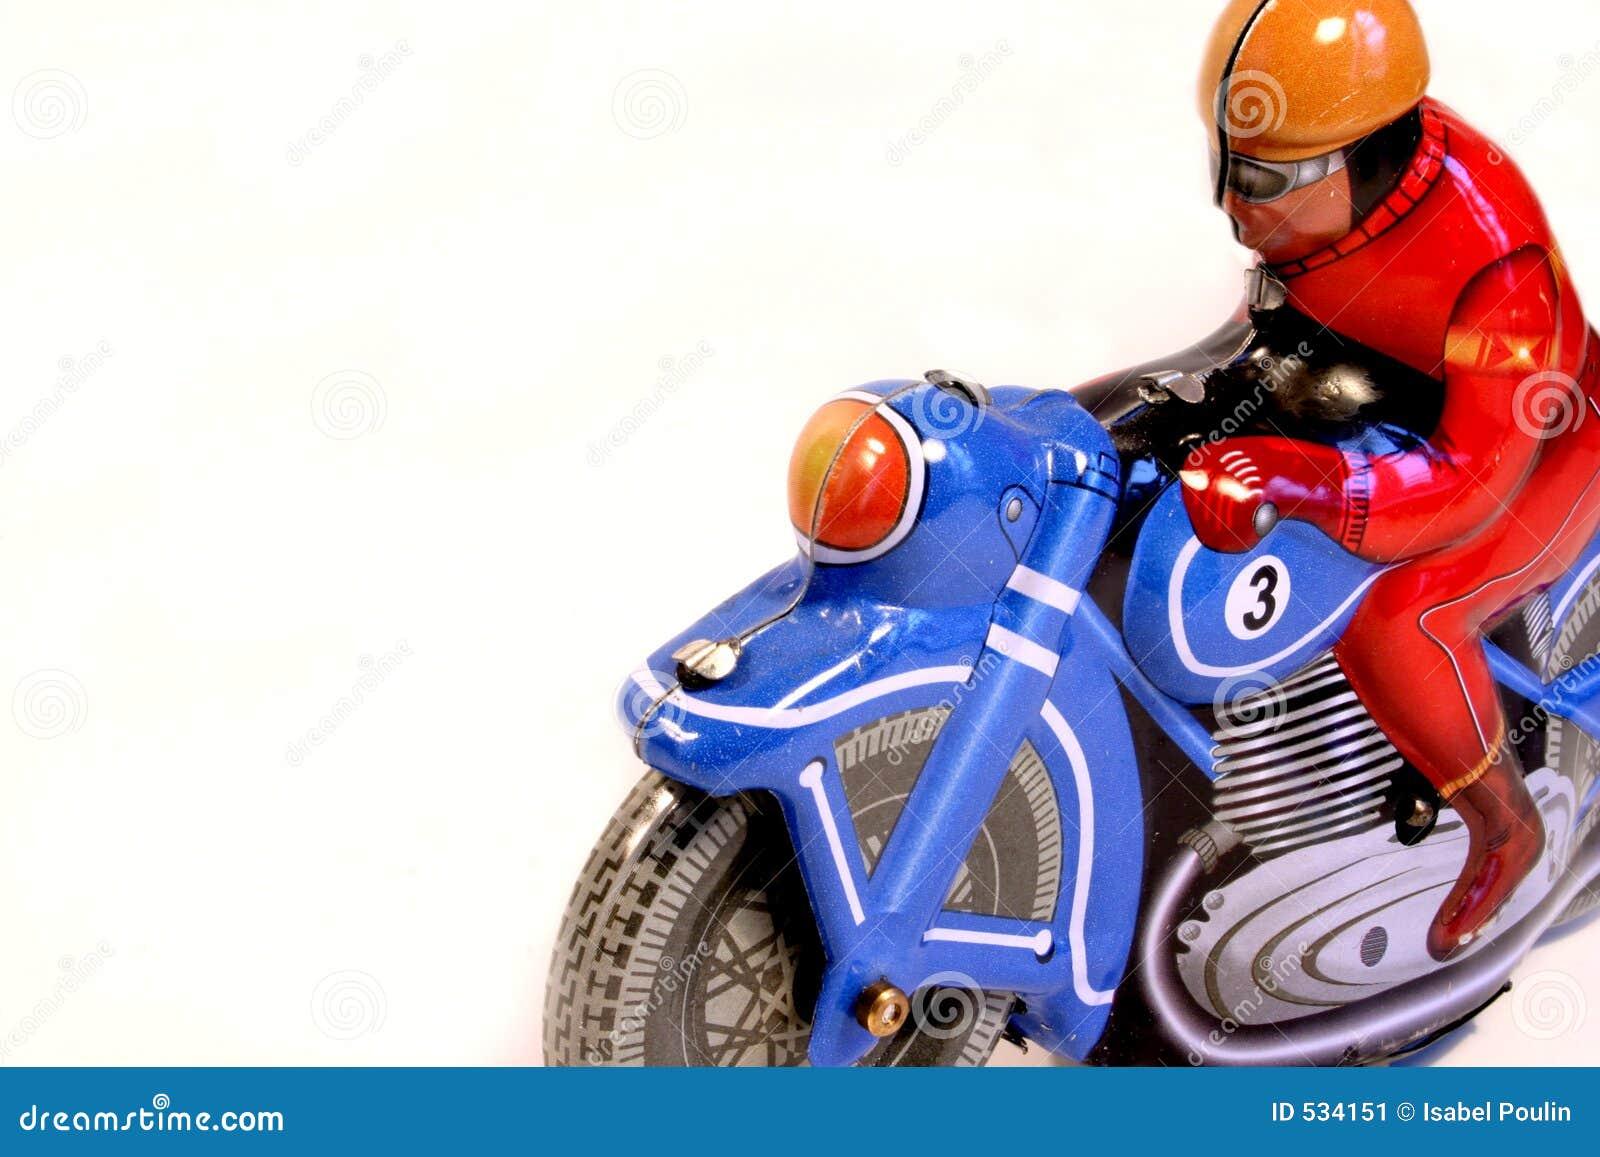 Download 玩具葡萄酒 库存图片. 图片 包括有 速度, 摩托车, 嬉戏, 对象, 减速火箭, 背包, 人员, 作用, 葡萄酒 - 534151